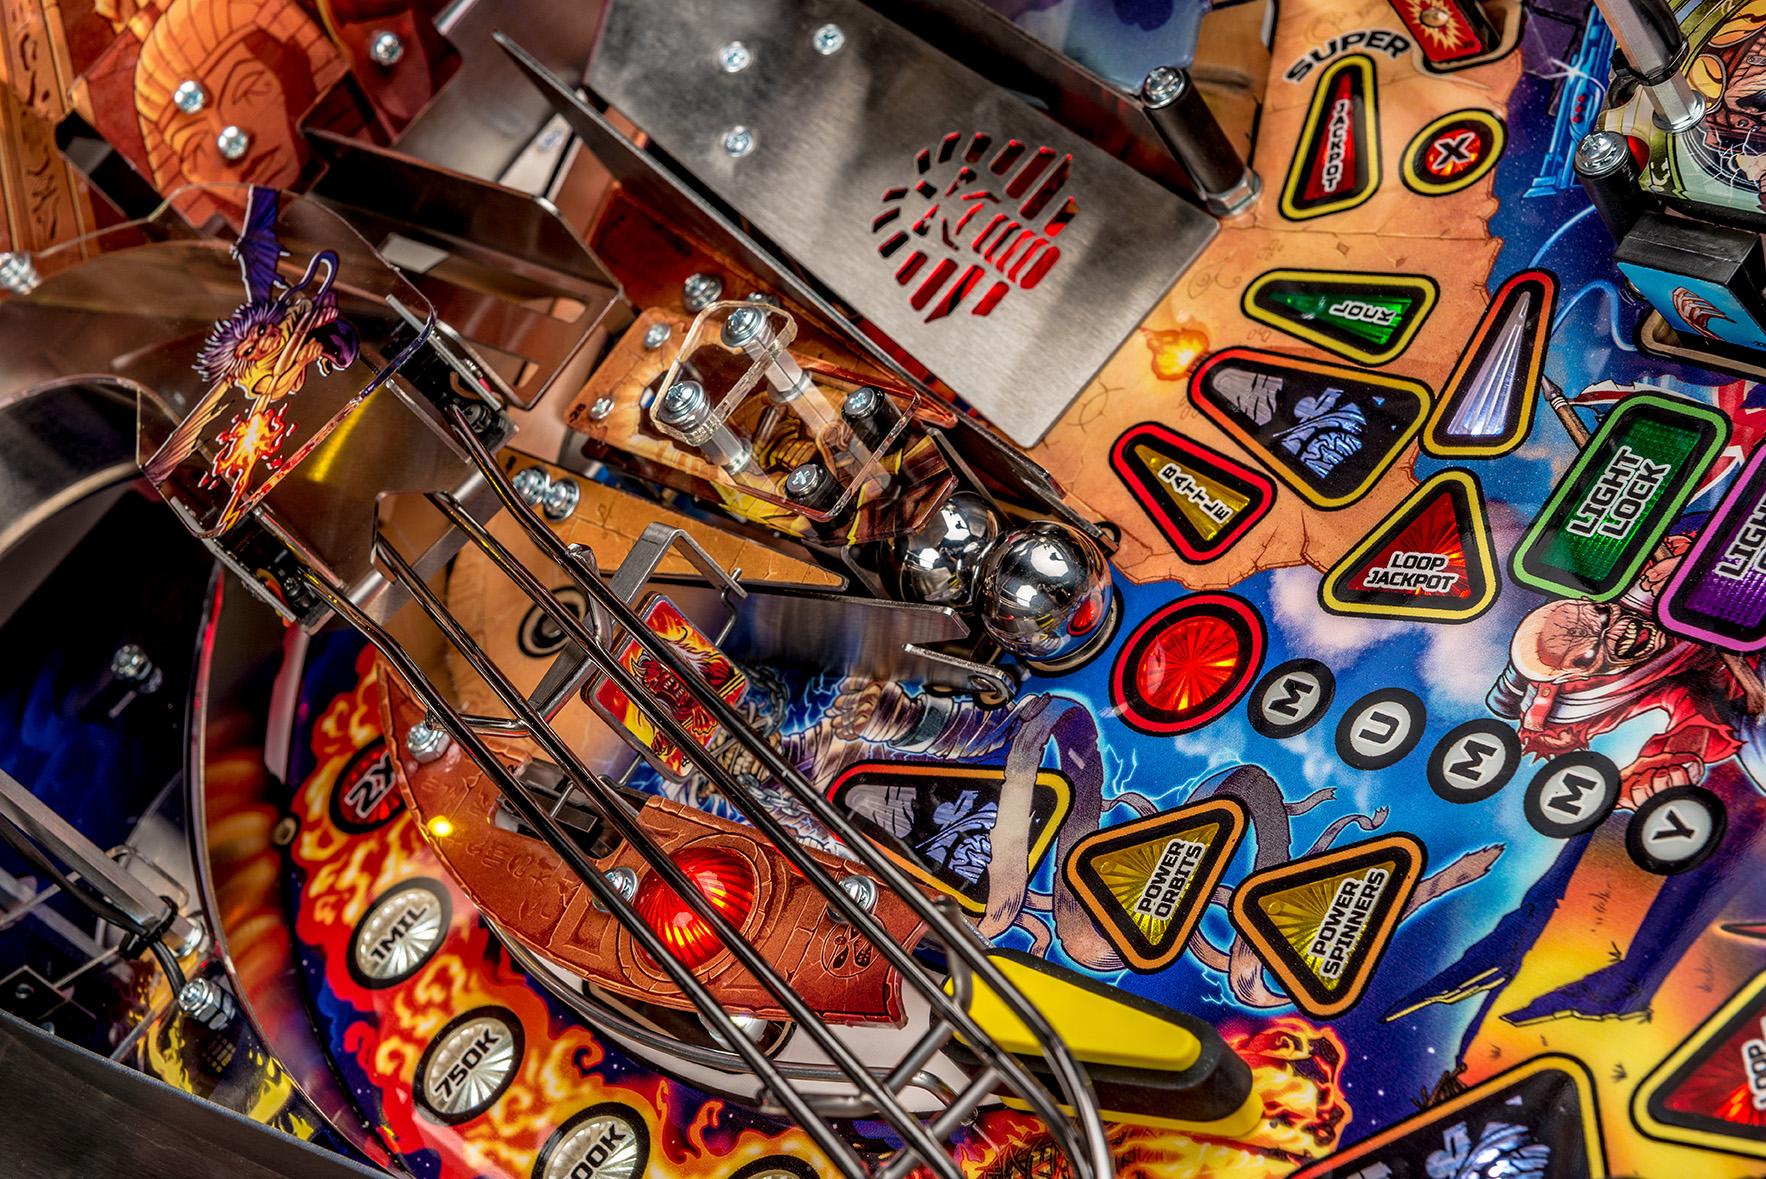 Iron-Maiden-Pinball-Machine-07a